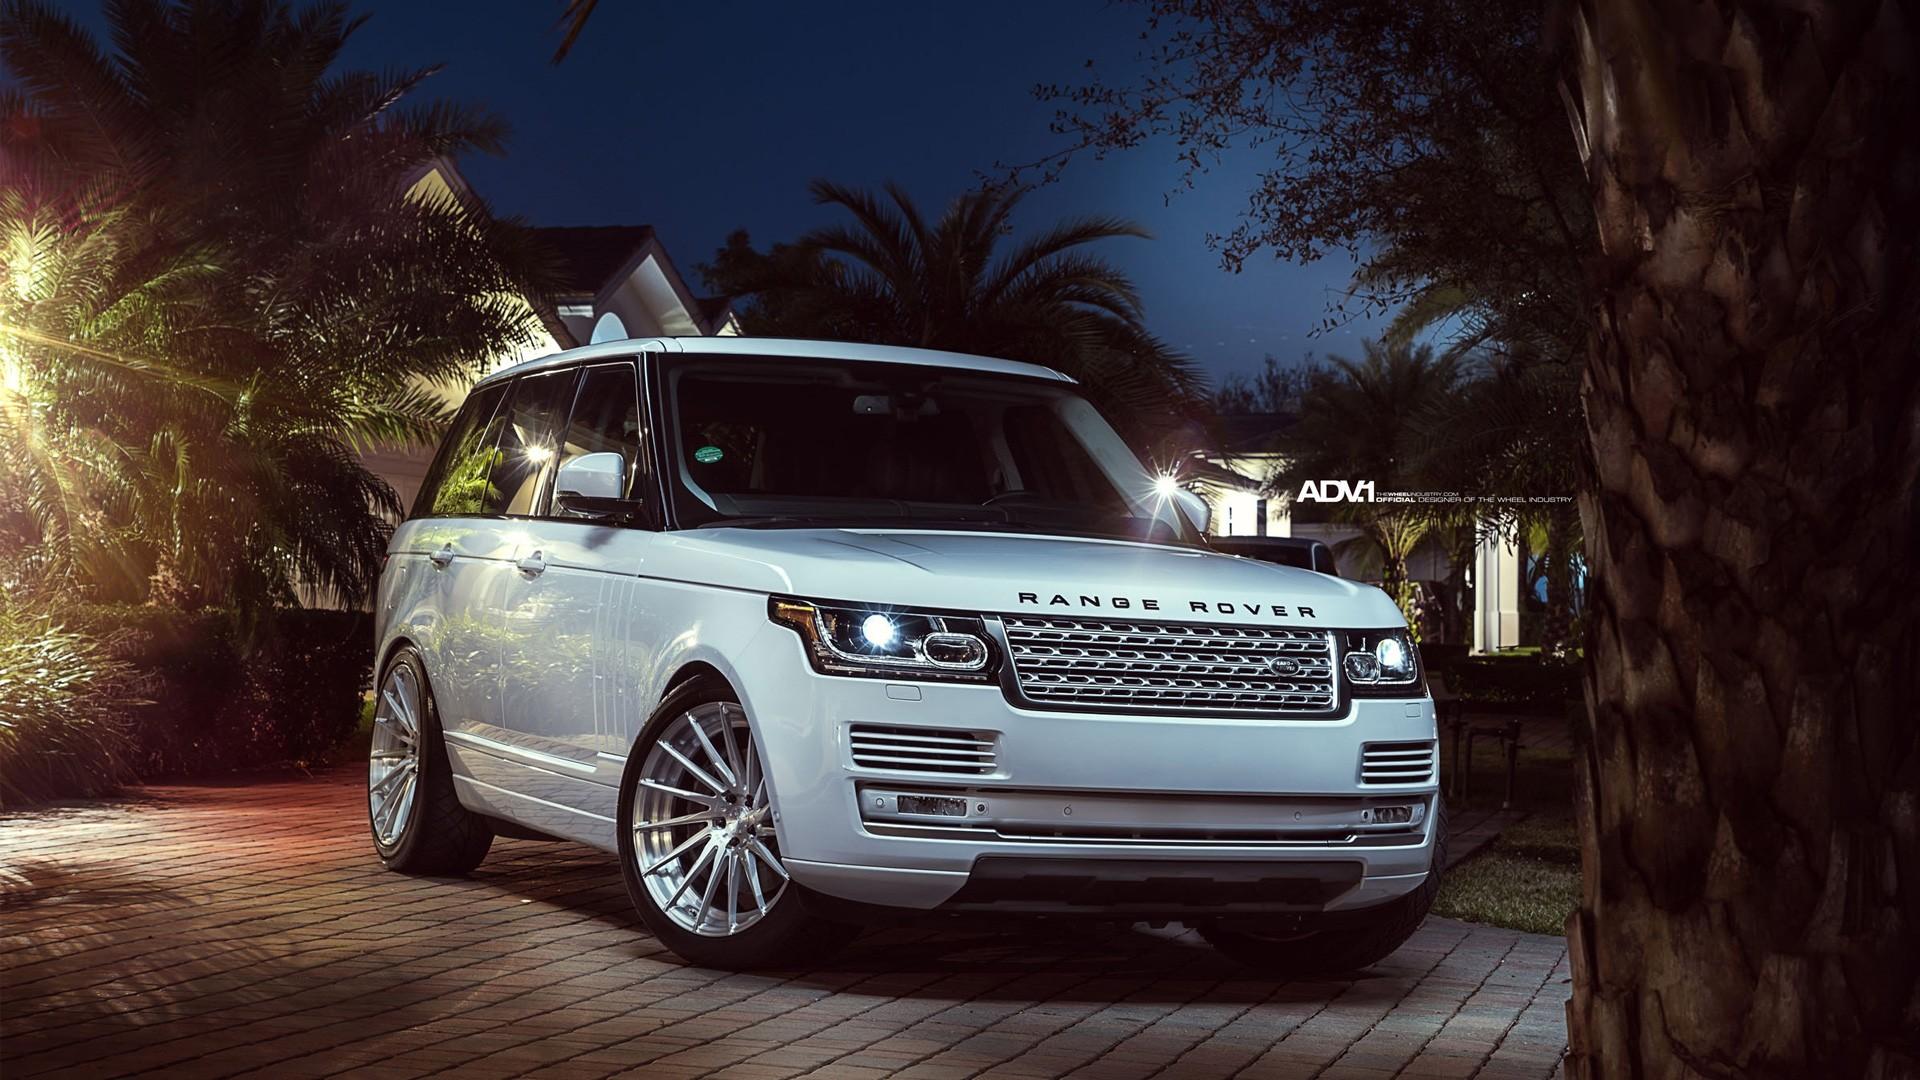 2016 Land Rover >> Range Rover HSE ADV15R Wallpaper | HD Car Wallpapers | ID ...